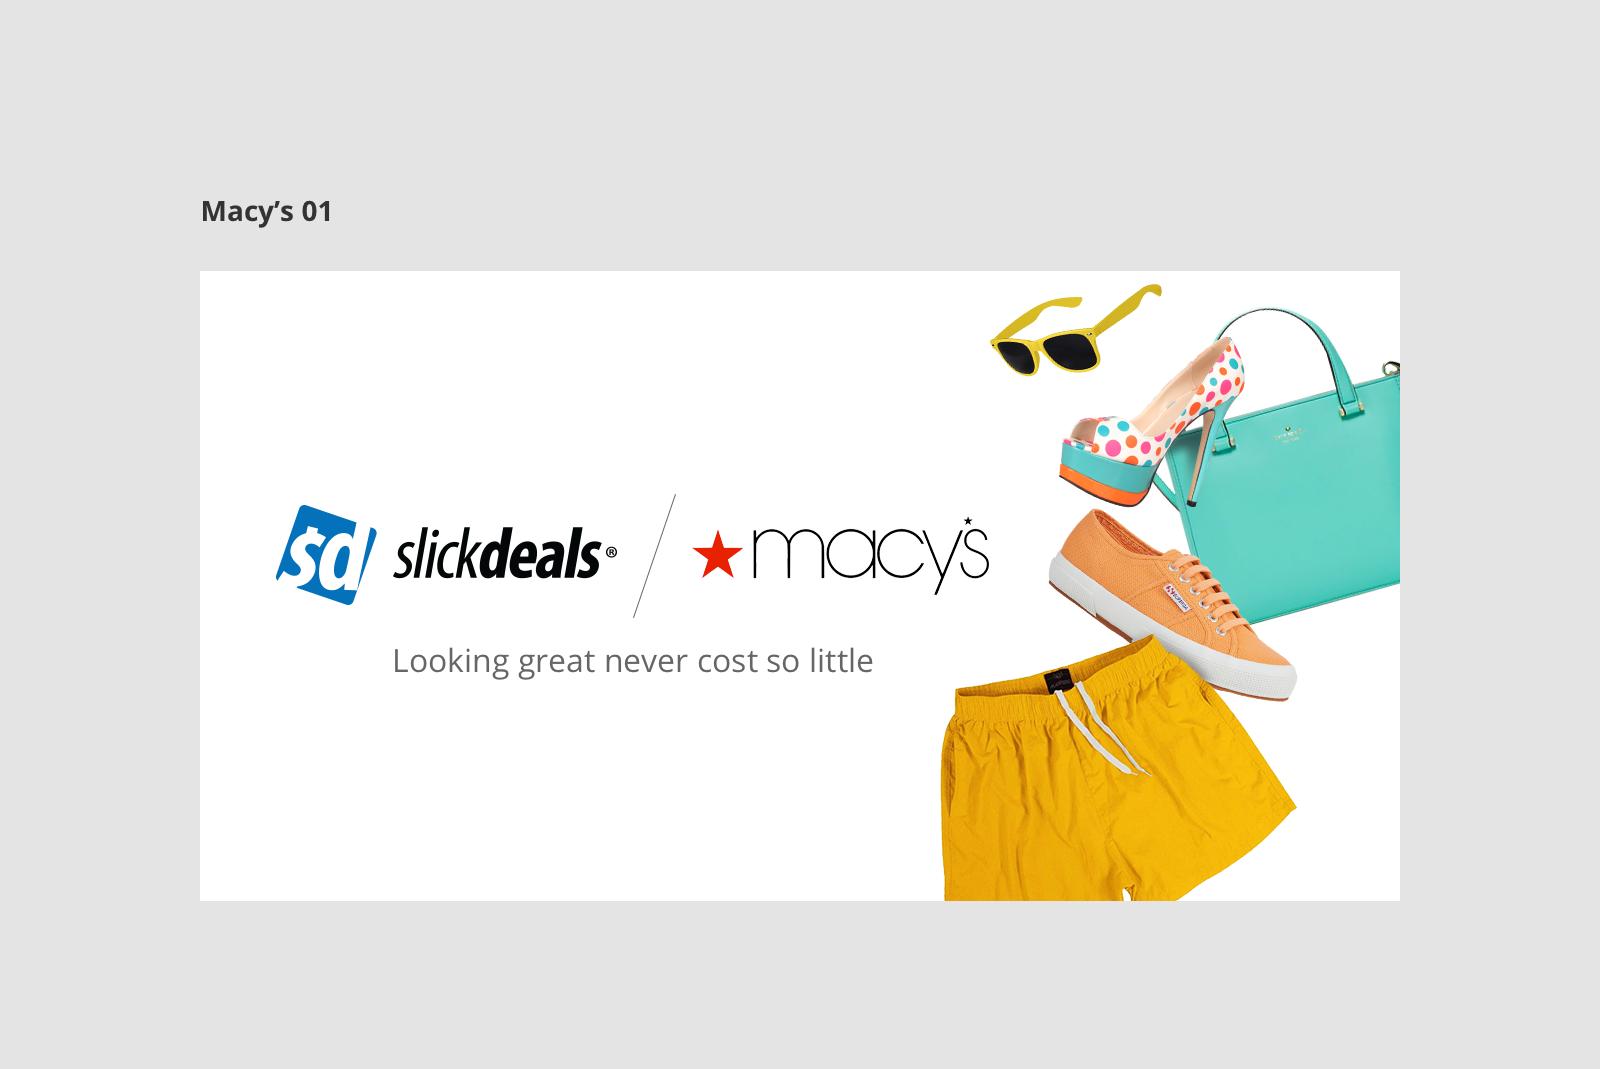 30% Off Macy's Coupons \u0026 Promo Codes